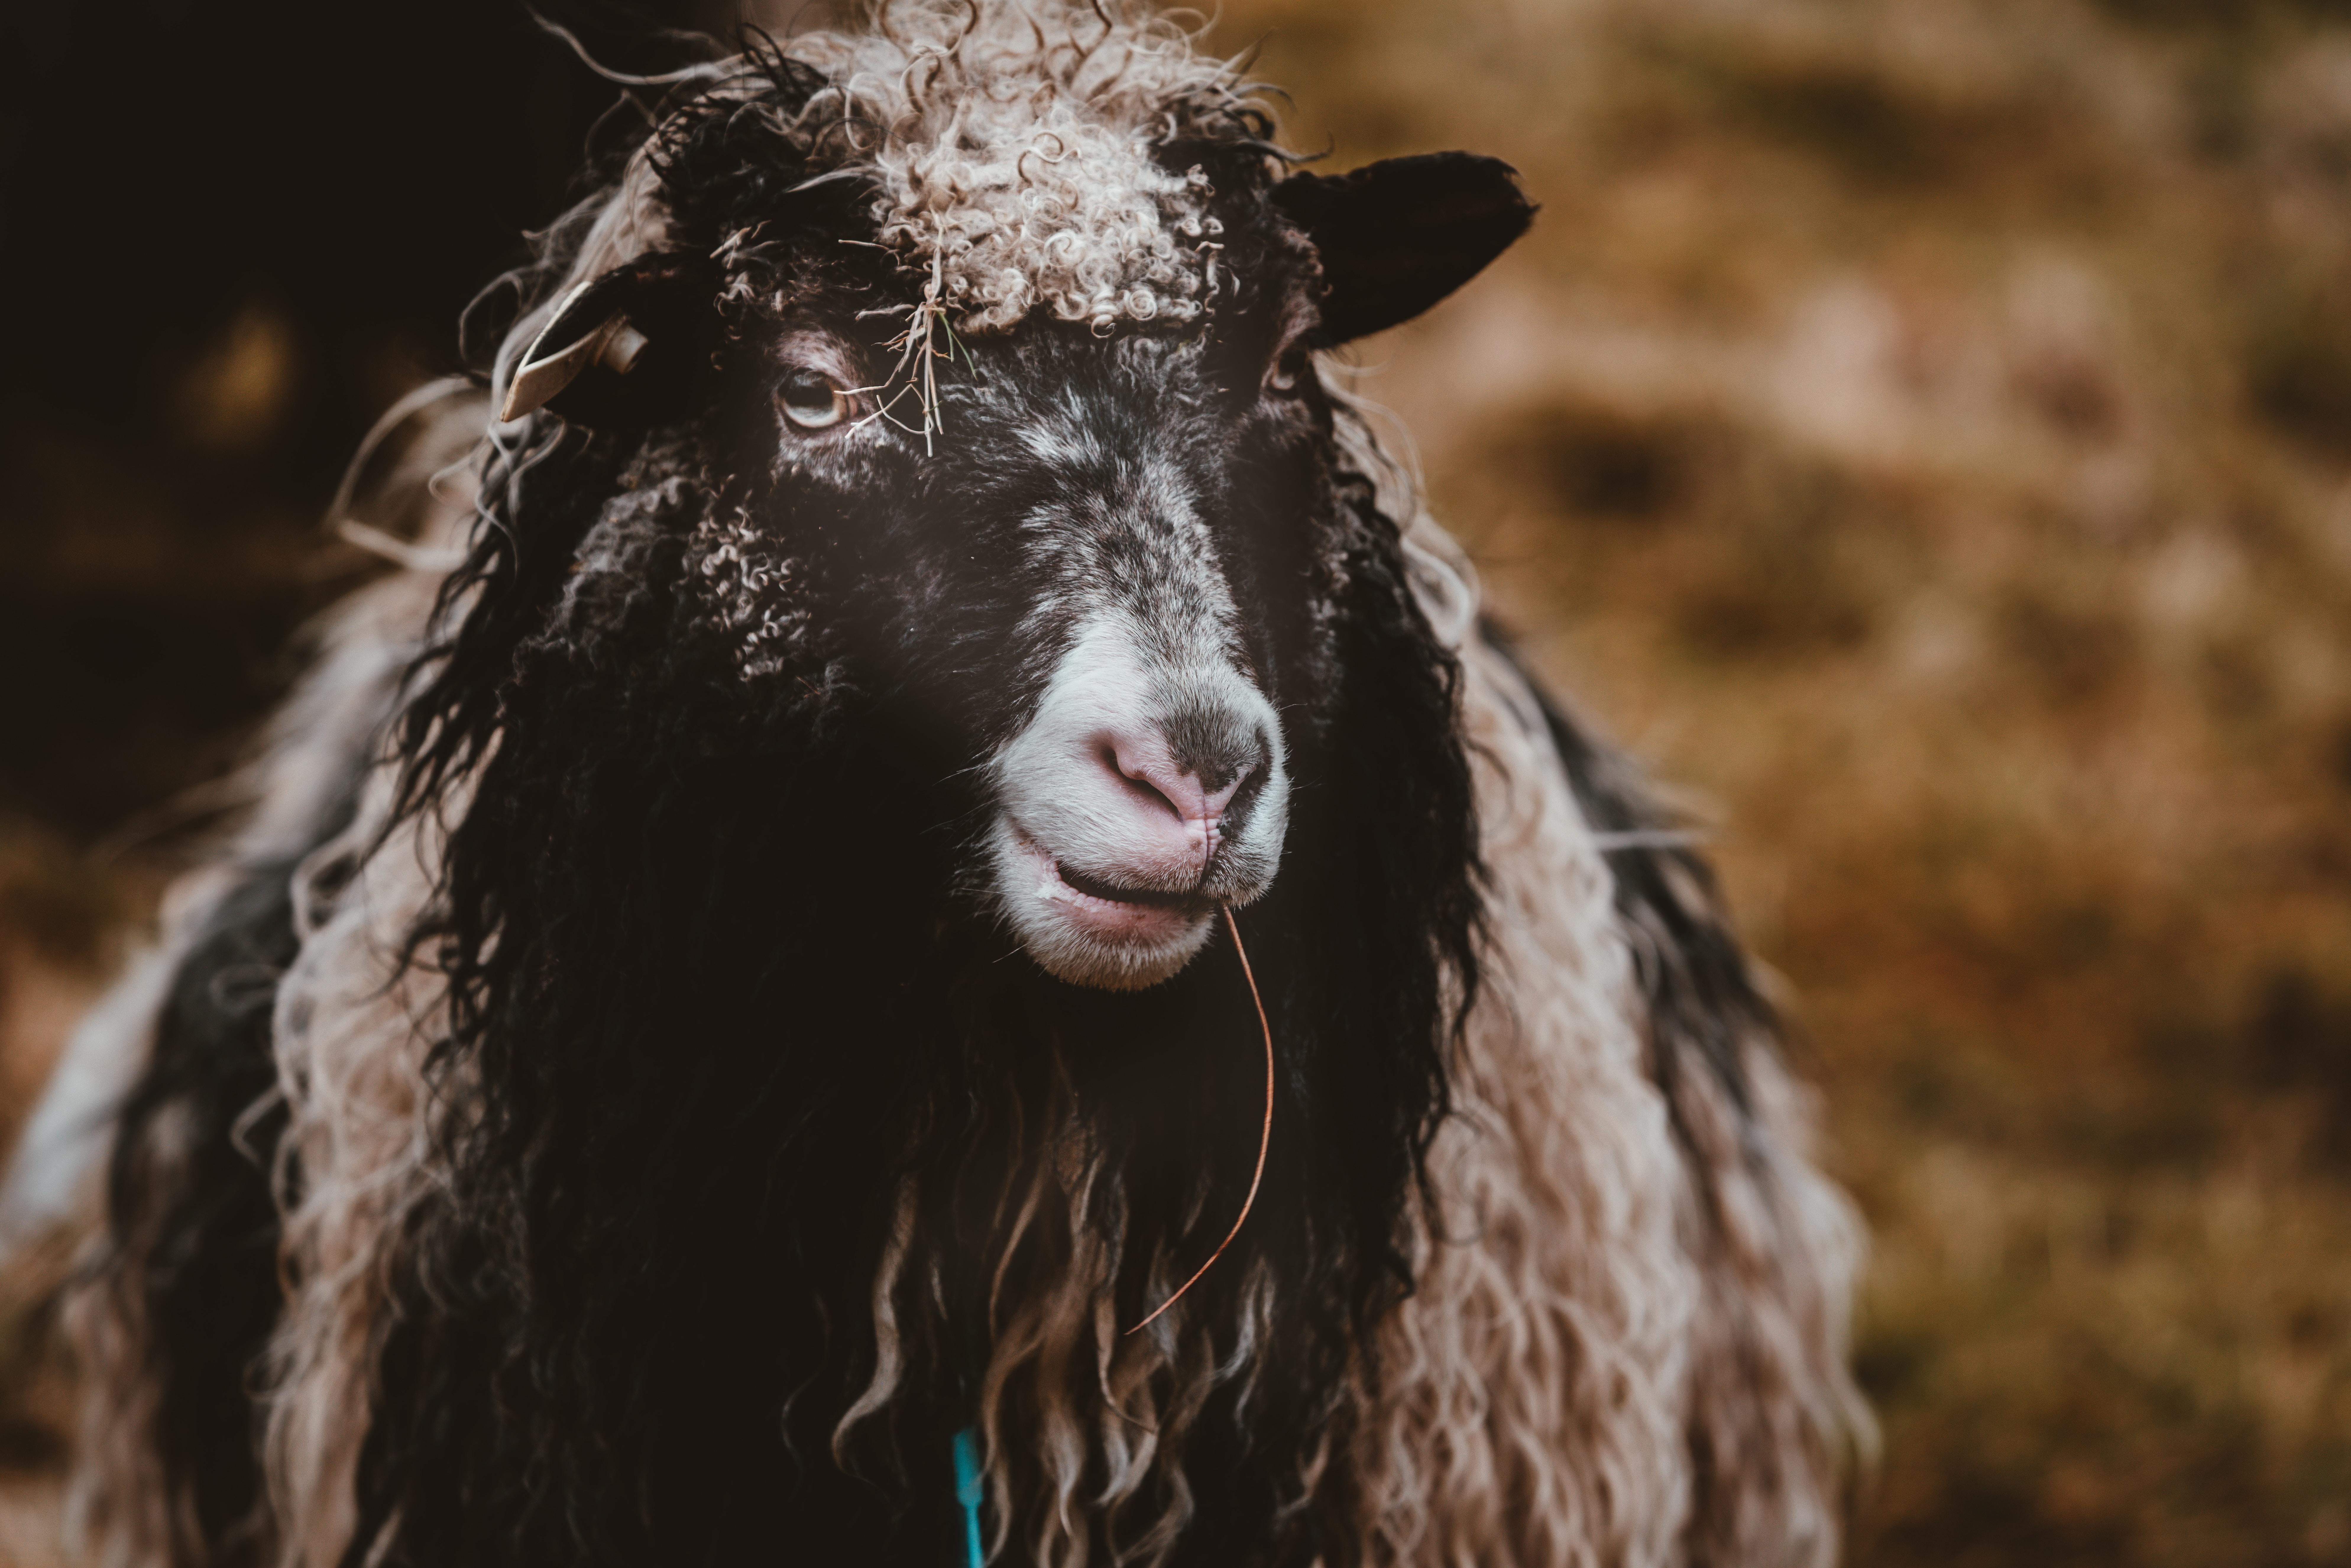 closeup photo of black and tan goat